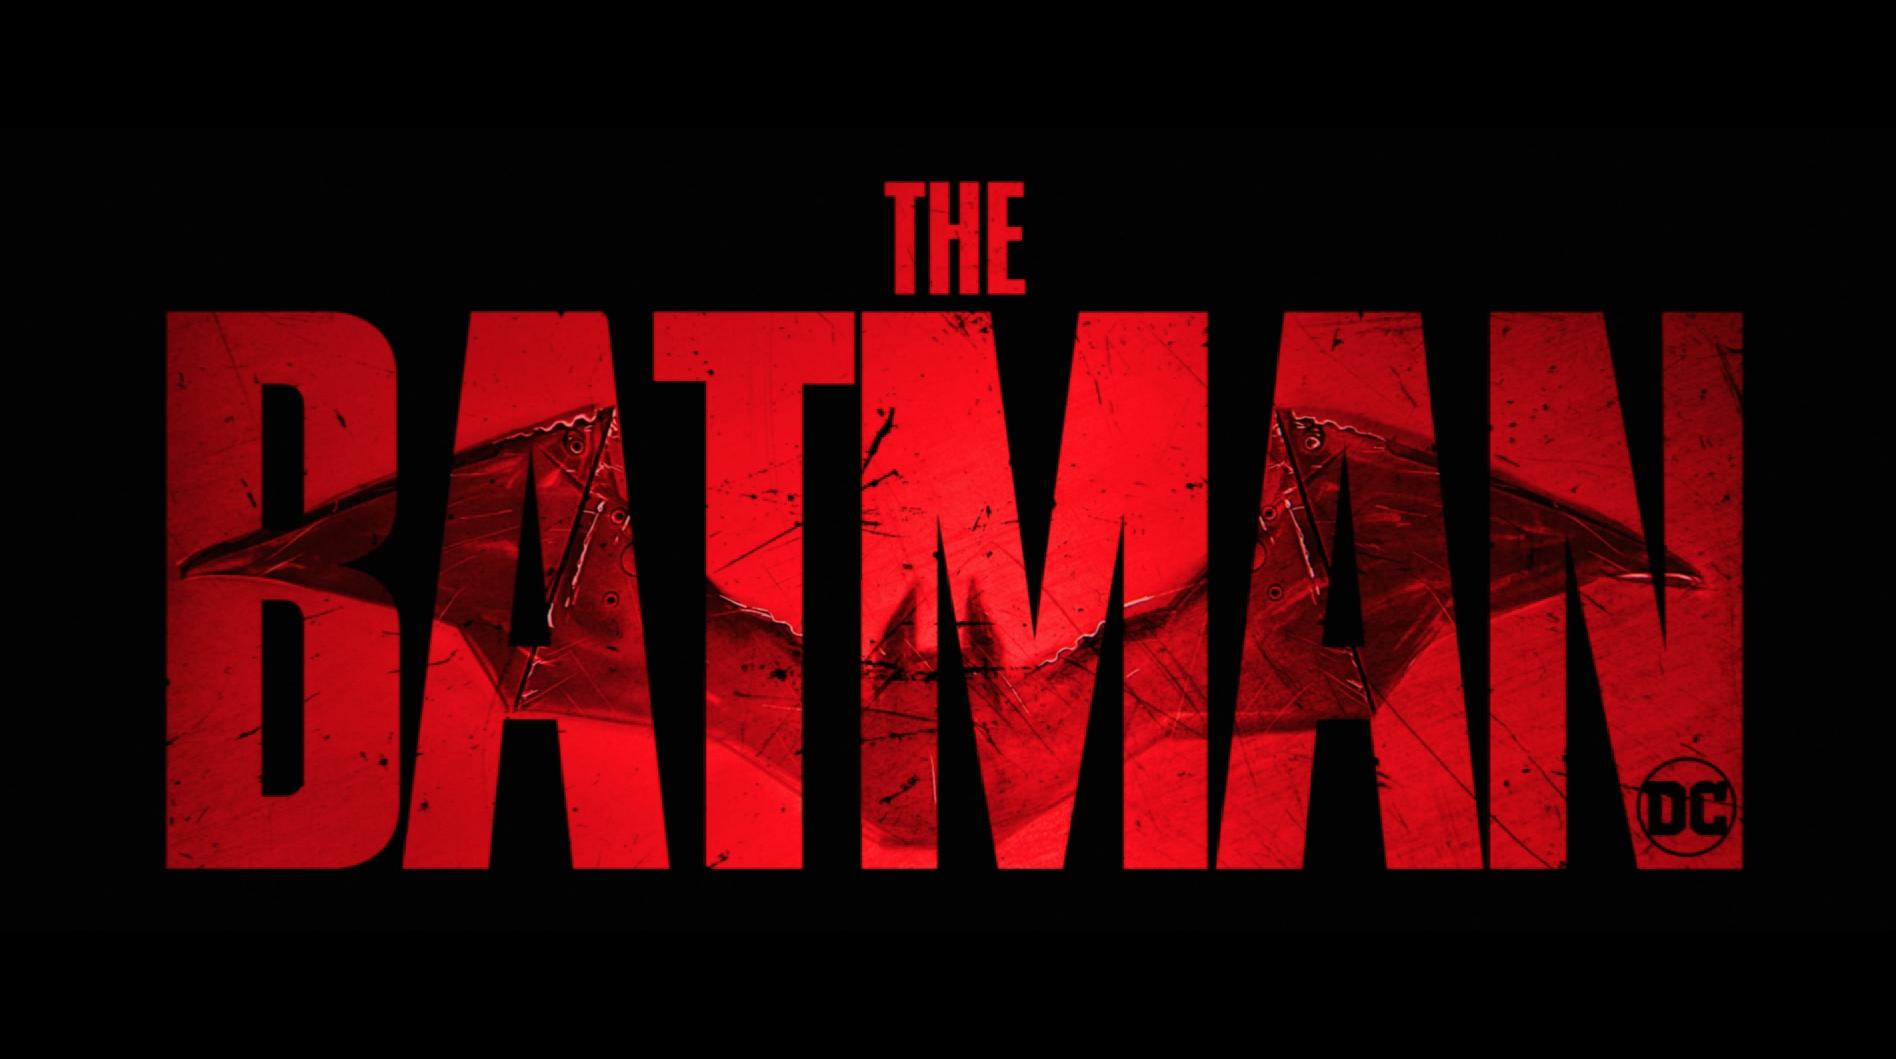 The new 'The Batman' logo.